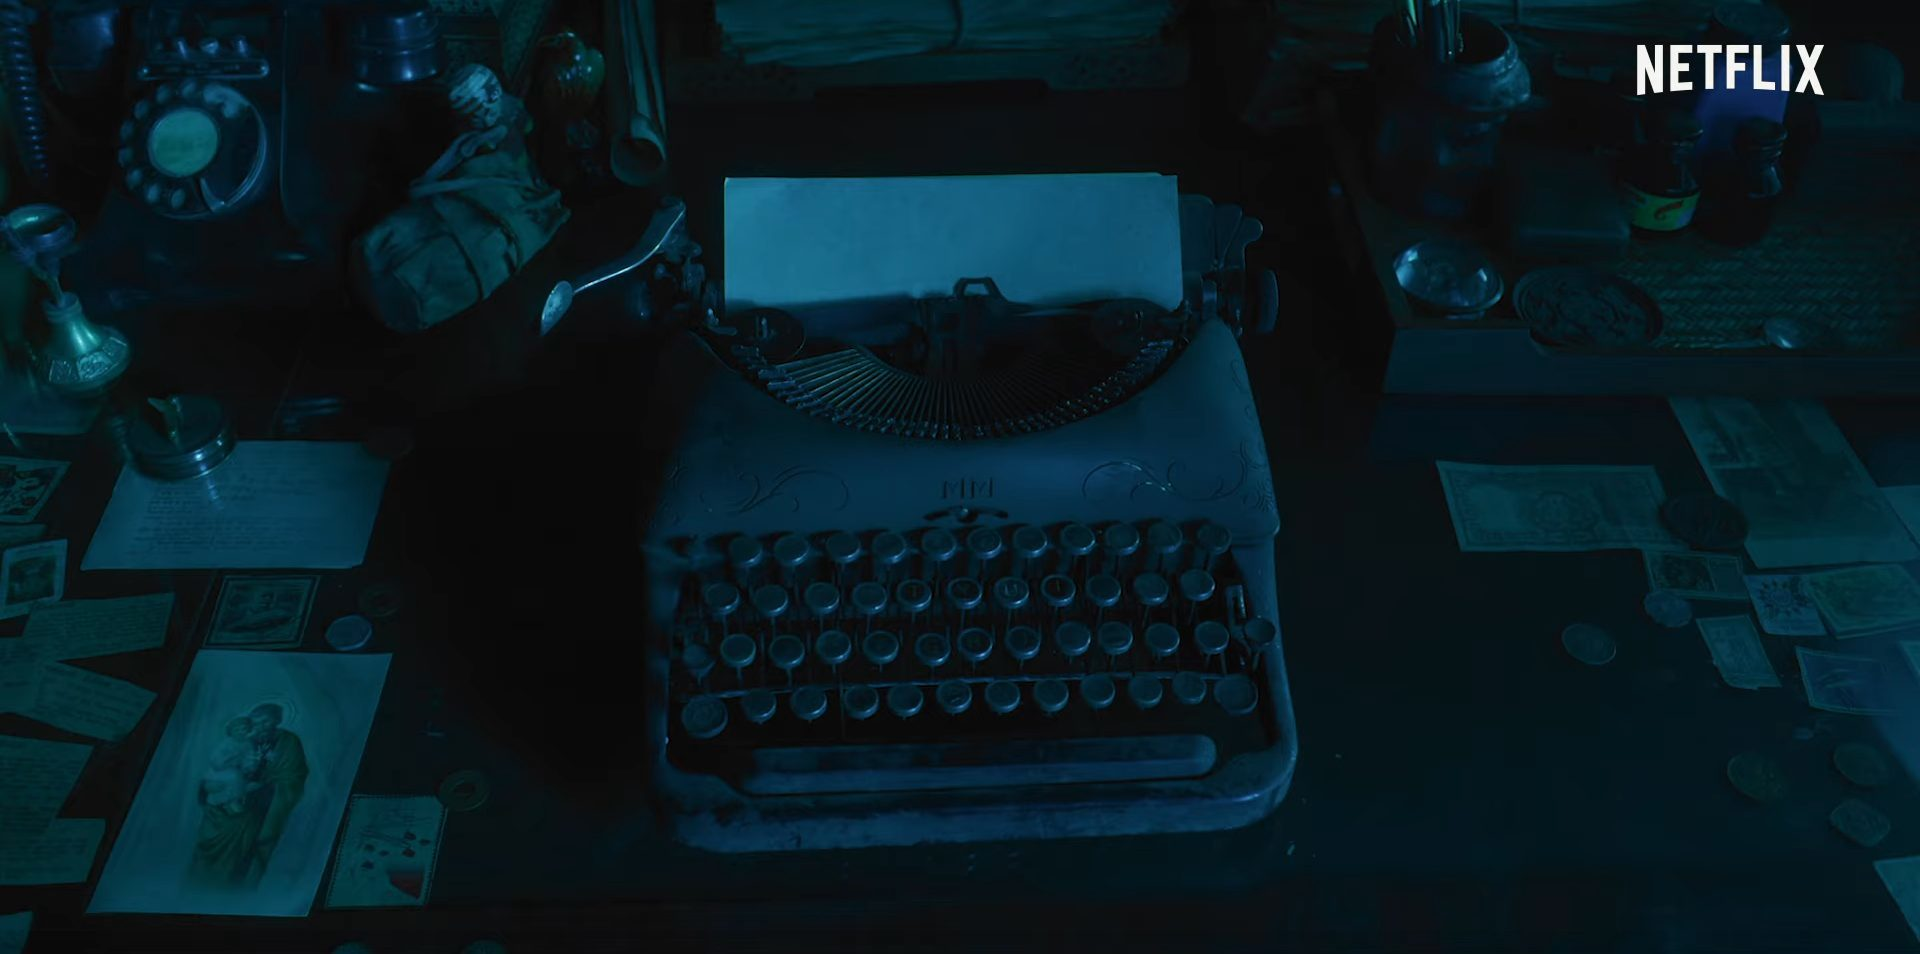 """Typewriter"": Νέα Mini Σειρά με Φαντάσματα από την Ινδία"